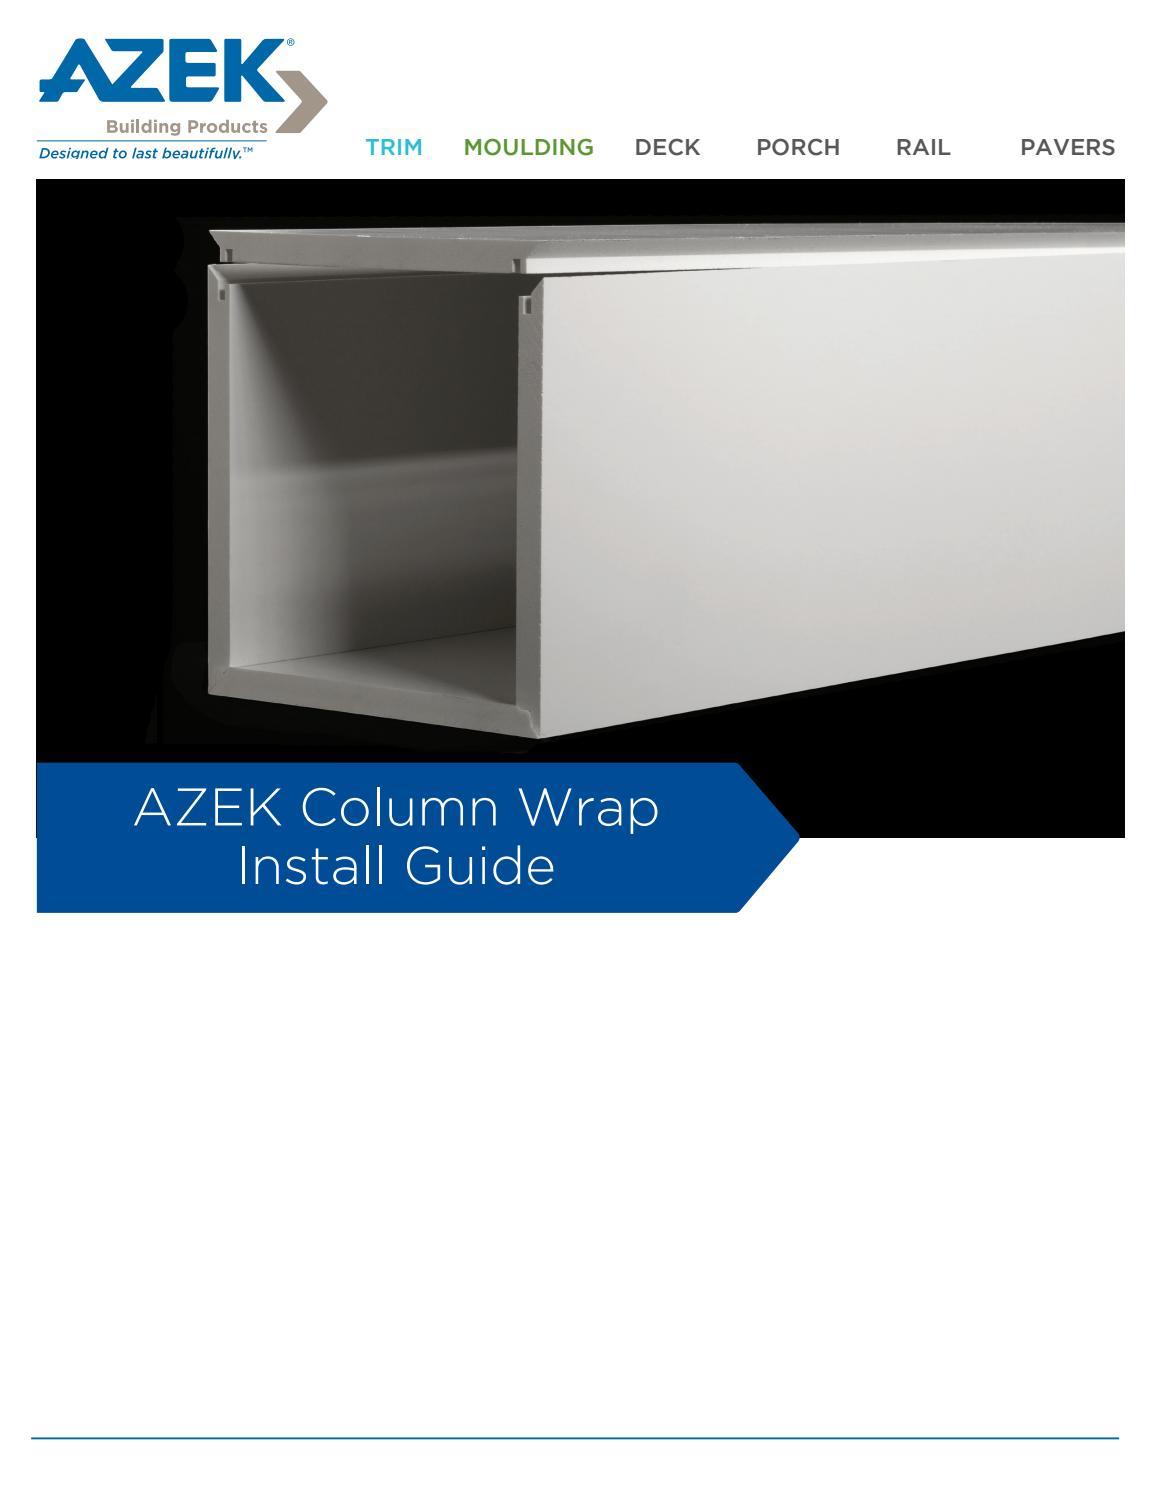 Azek Trim Column Wrap Install Guide